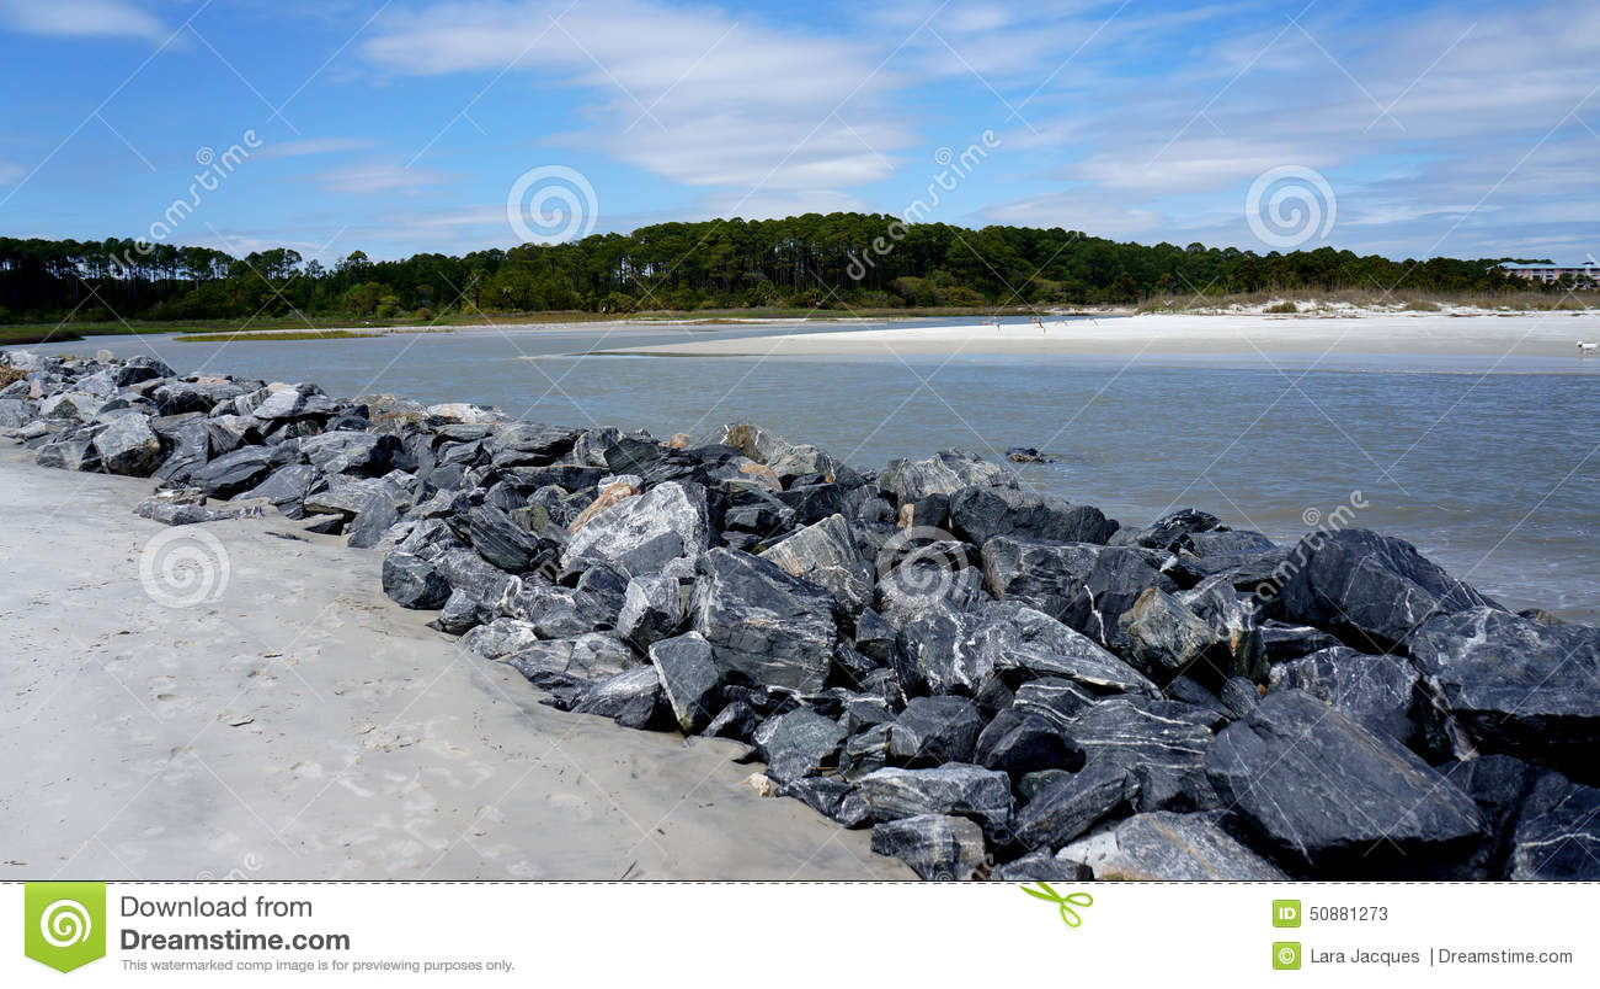 Hilton Head Island, South- Carolinastrand, felsige Sperre